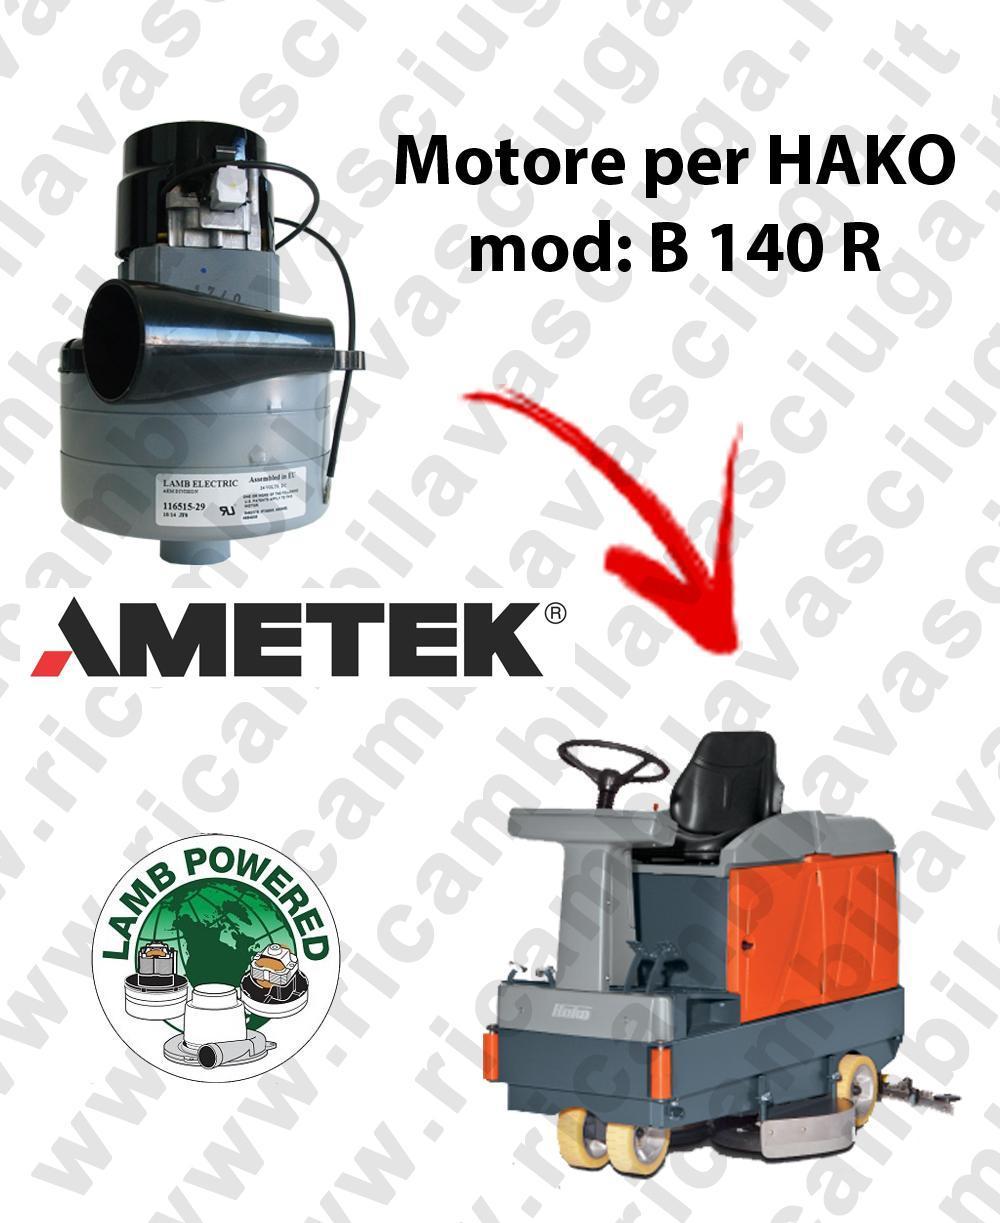 B 140 R Motore de aspiración LAMB AMETEK para fregadora HAKO